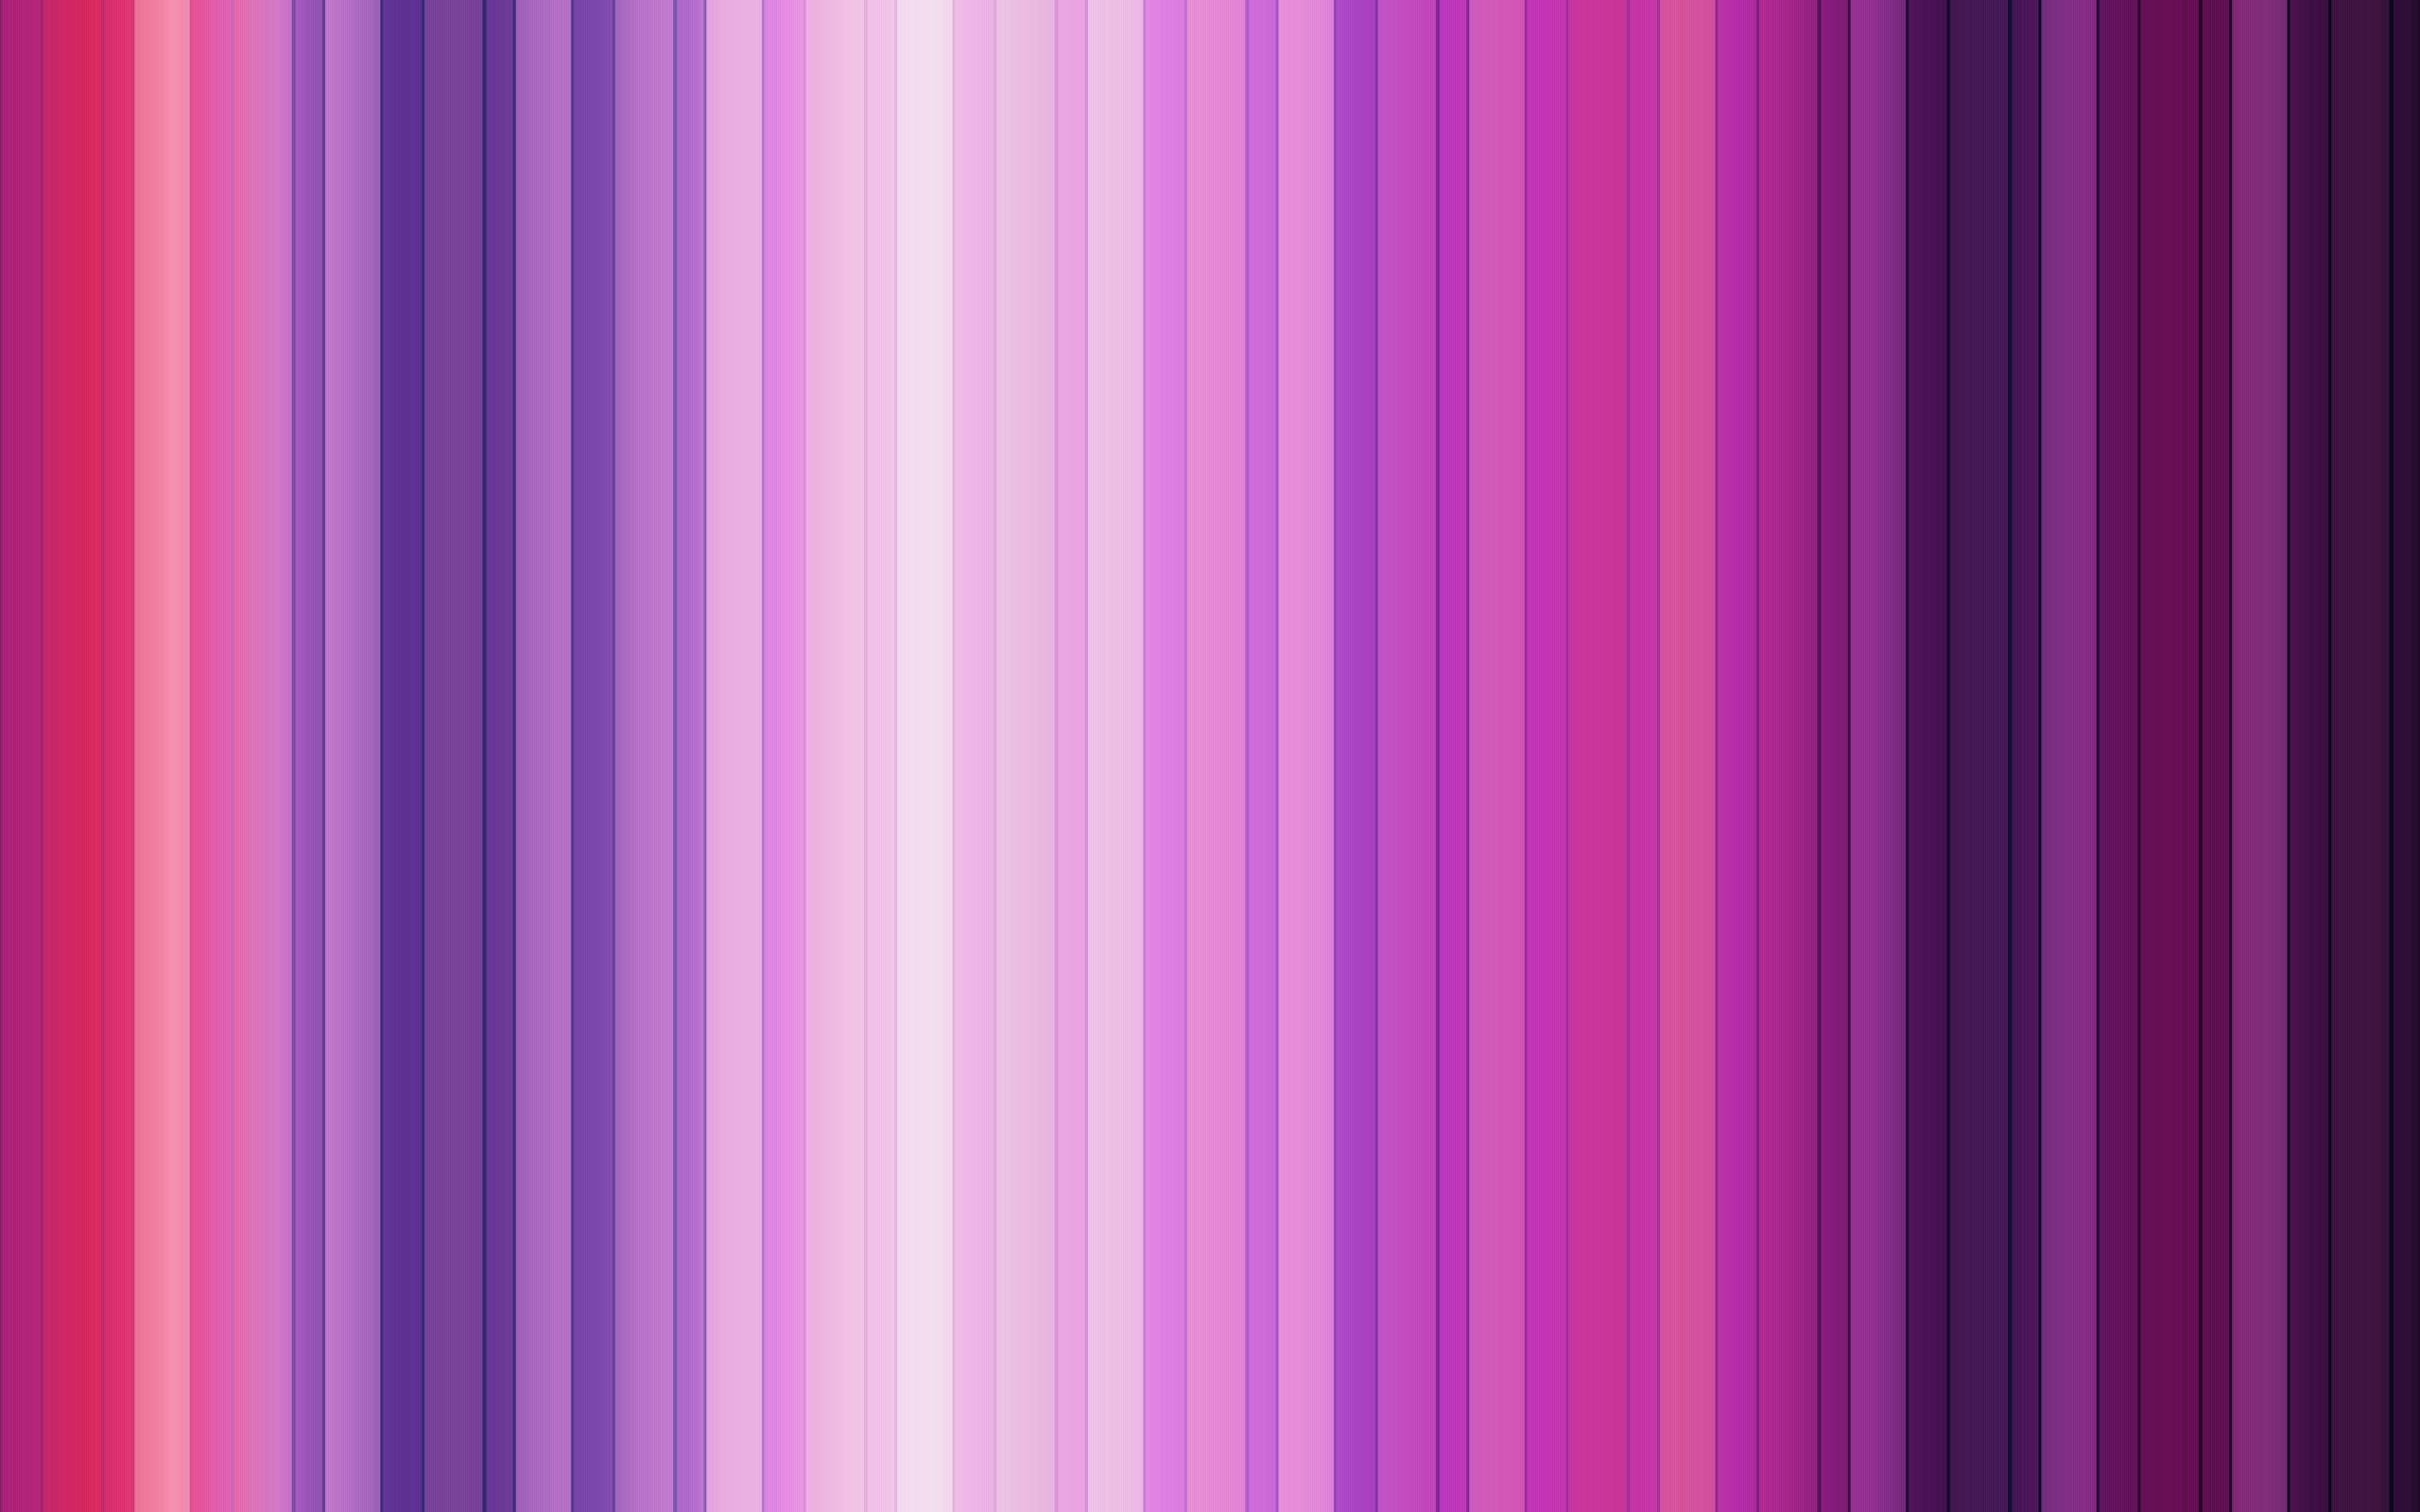 Cool Pink Wallpaper 45116